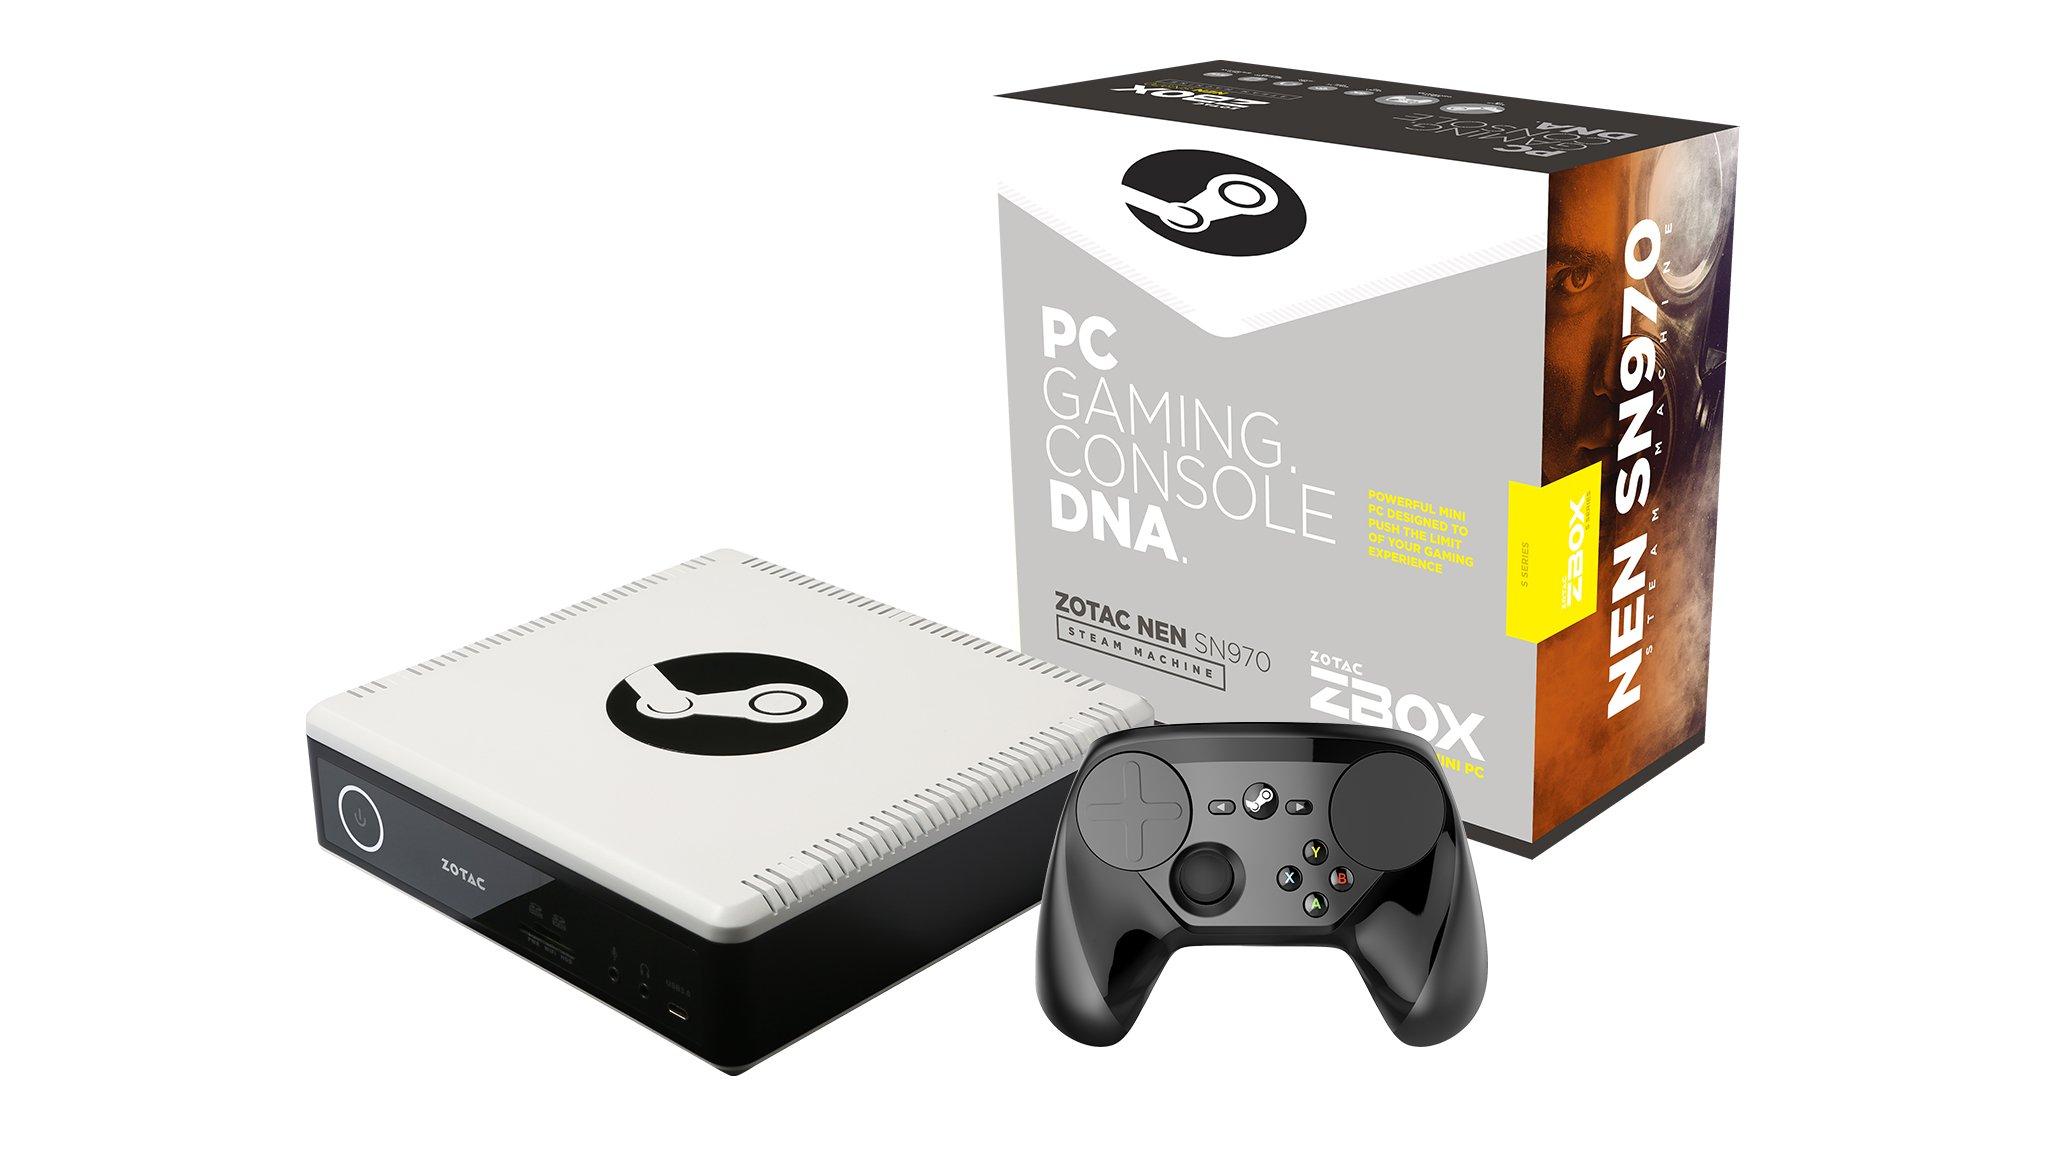 ZOTAC NEN Steam Machine ZBOX-SN970-P-U Gaming Mini PC (Intel Core i5-6400T Quad Core 2.2 GHz, 8 GB, 1TB Hard Drive, NVIDIA GeForce GTX 960 3GB GDDR5)